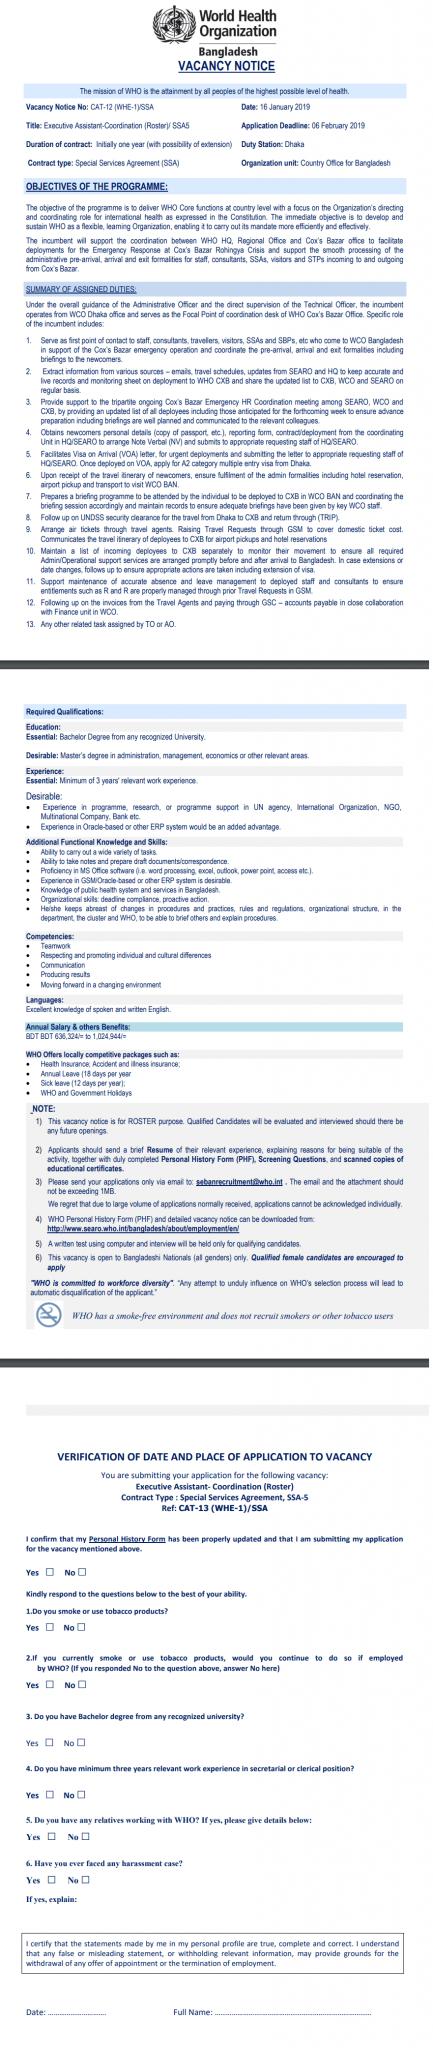 World Health Organization Job Circular 2019